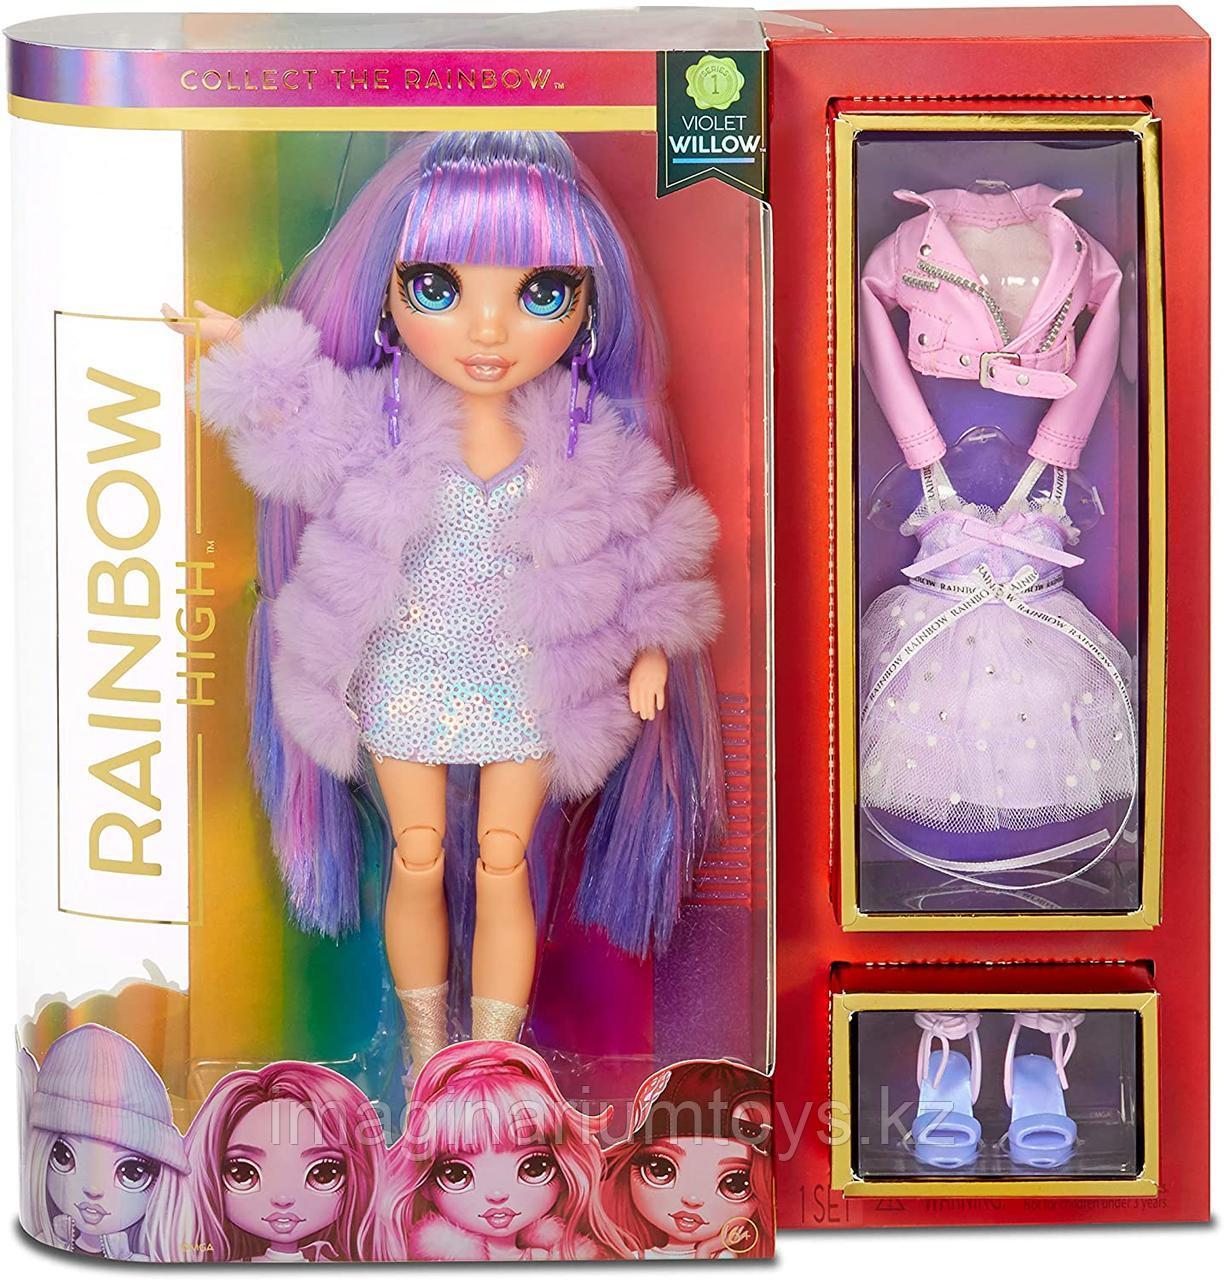 Кукла Реинбоу Хай фиолетовая Rainbow High Surprise Violet Willow - фото 1